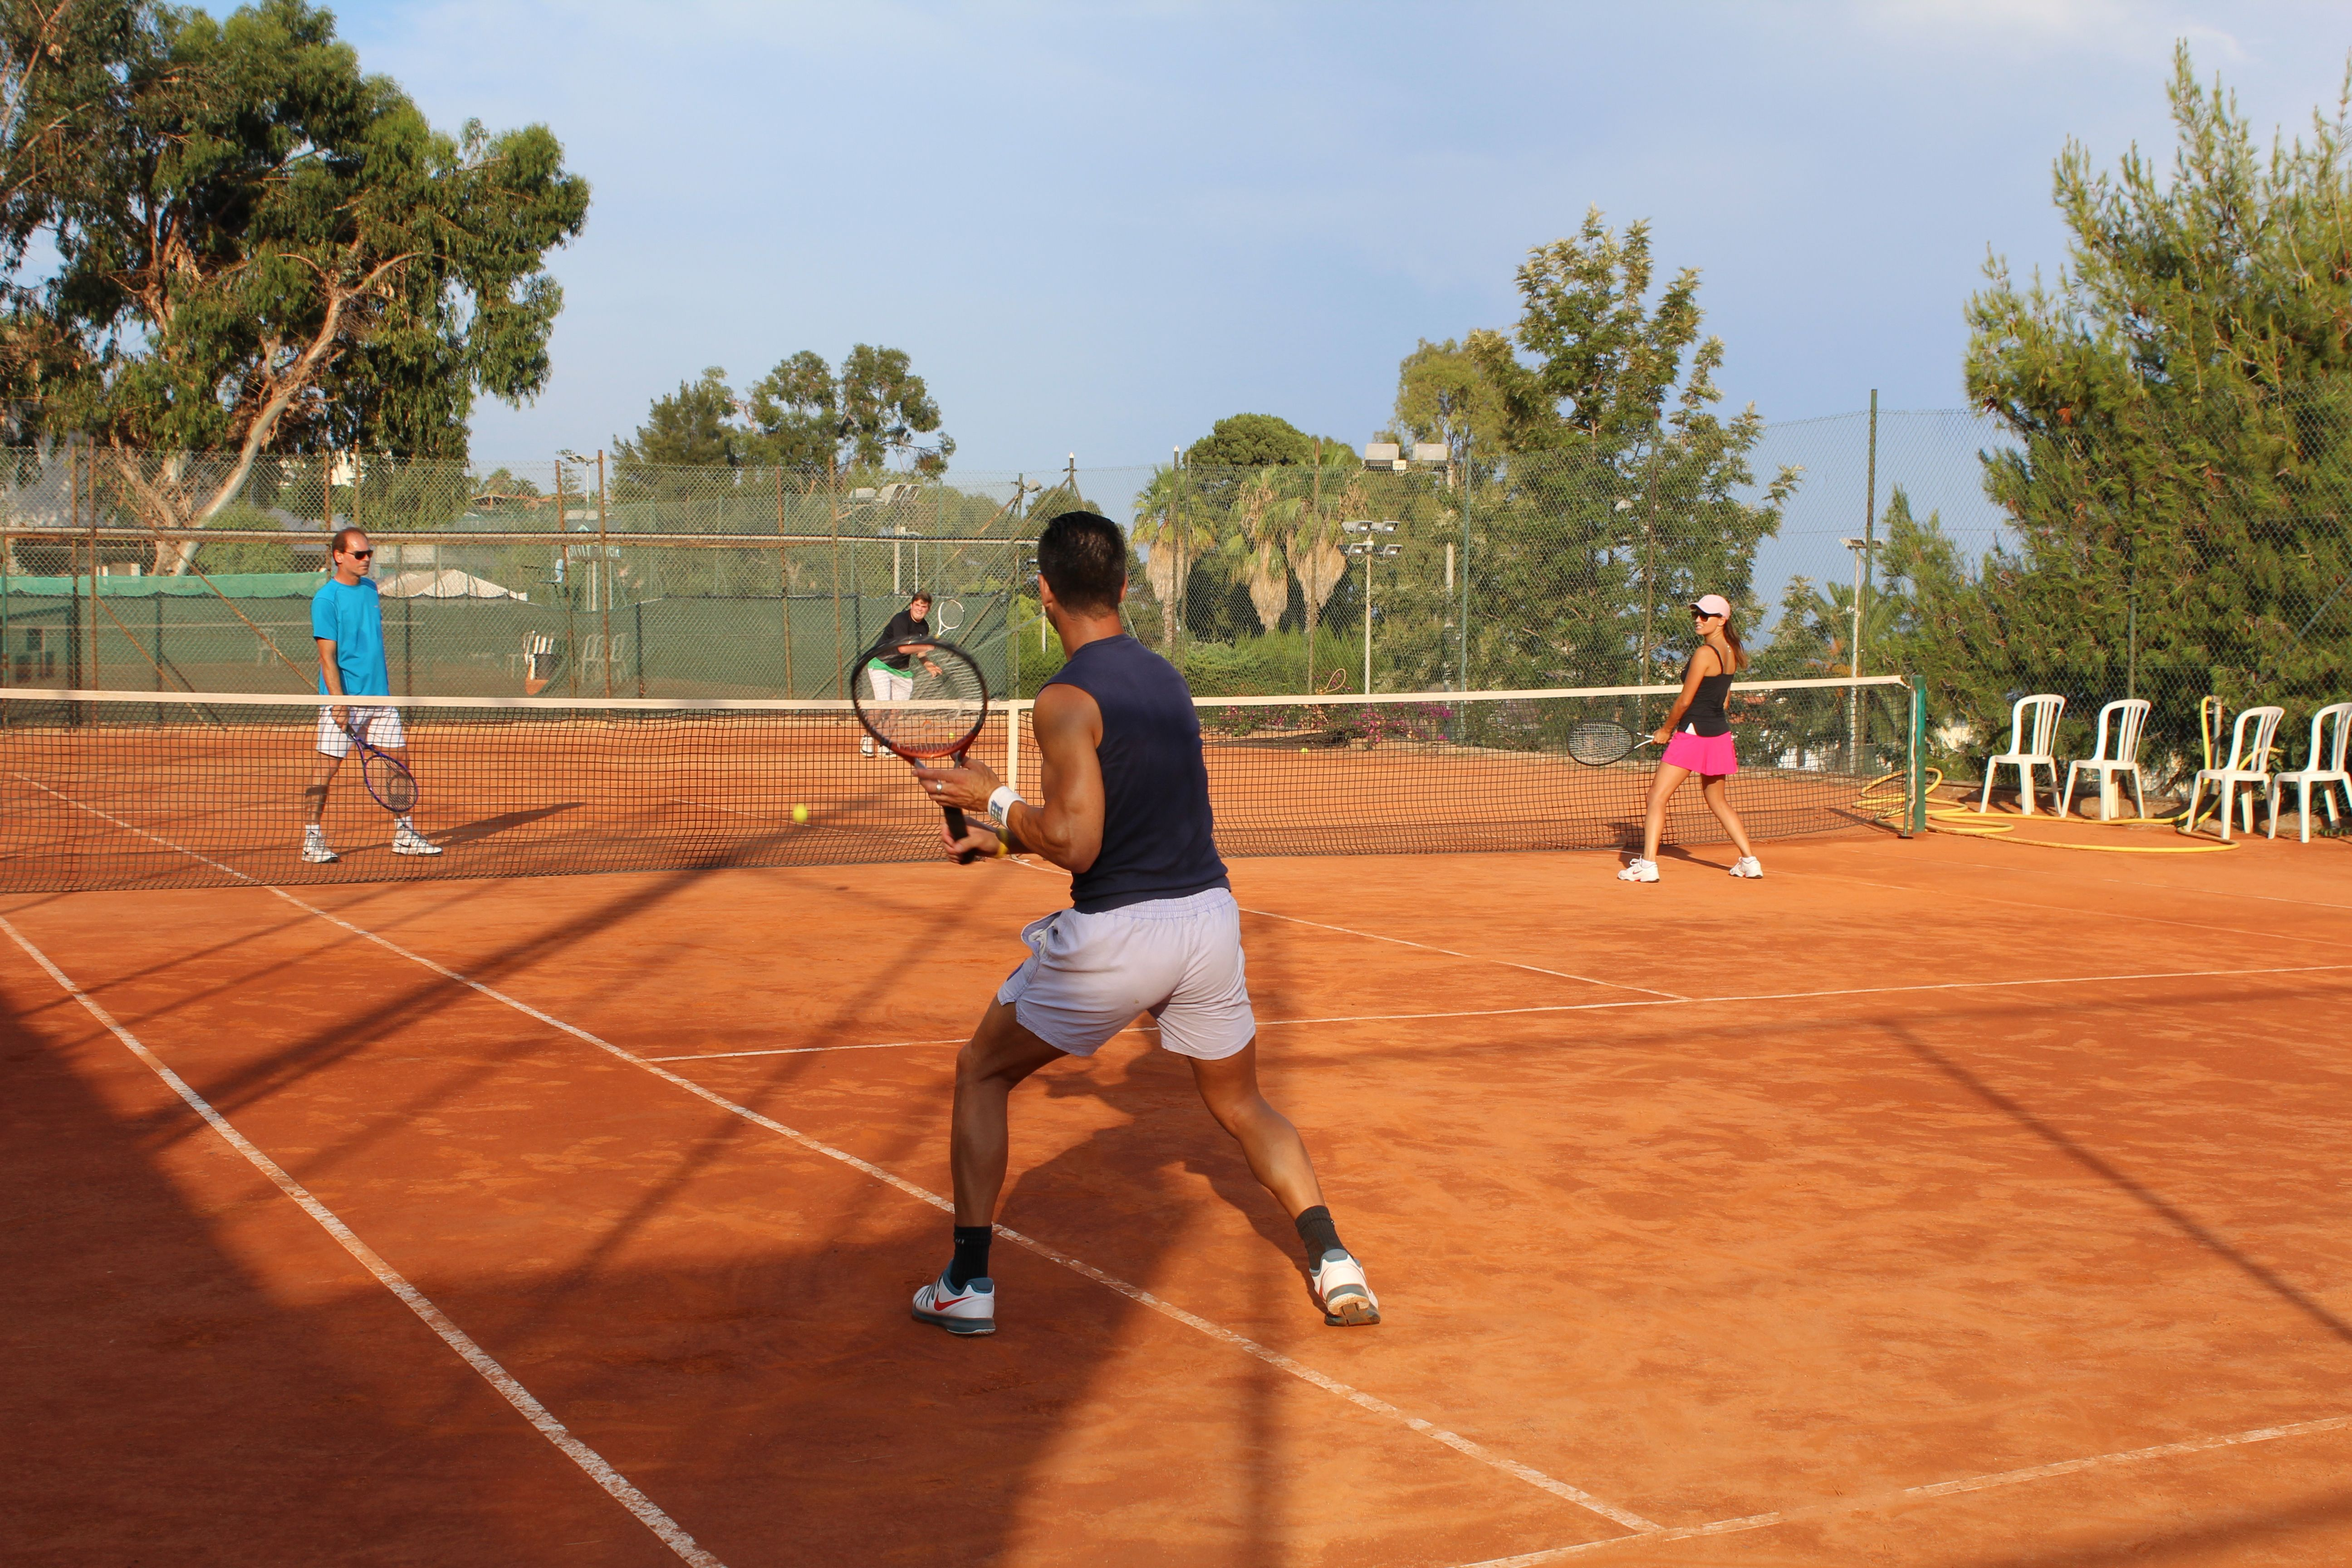 Learn Italian and play tennis too -  Omnilingua´s Italian and Tennis course. #learnitalian #studyitalian #studyinitaly #travelitaly #italianculture #italianlanguage